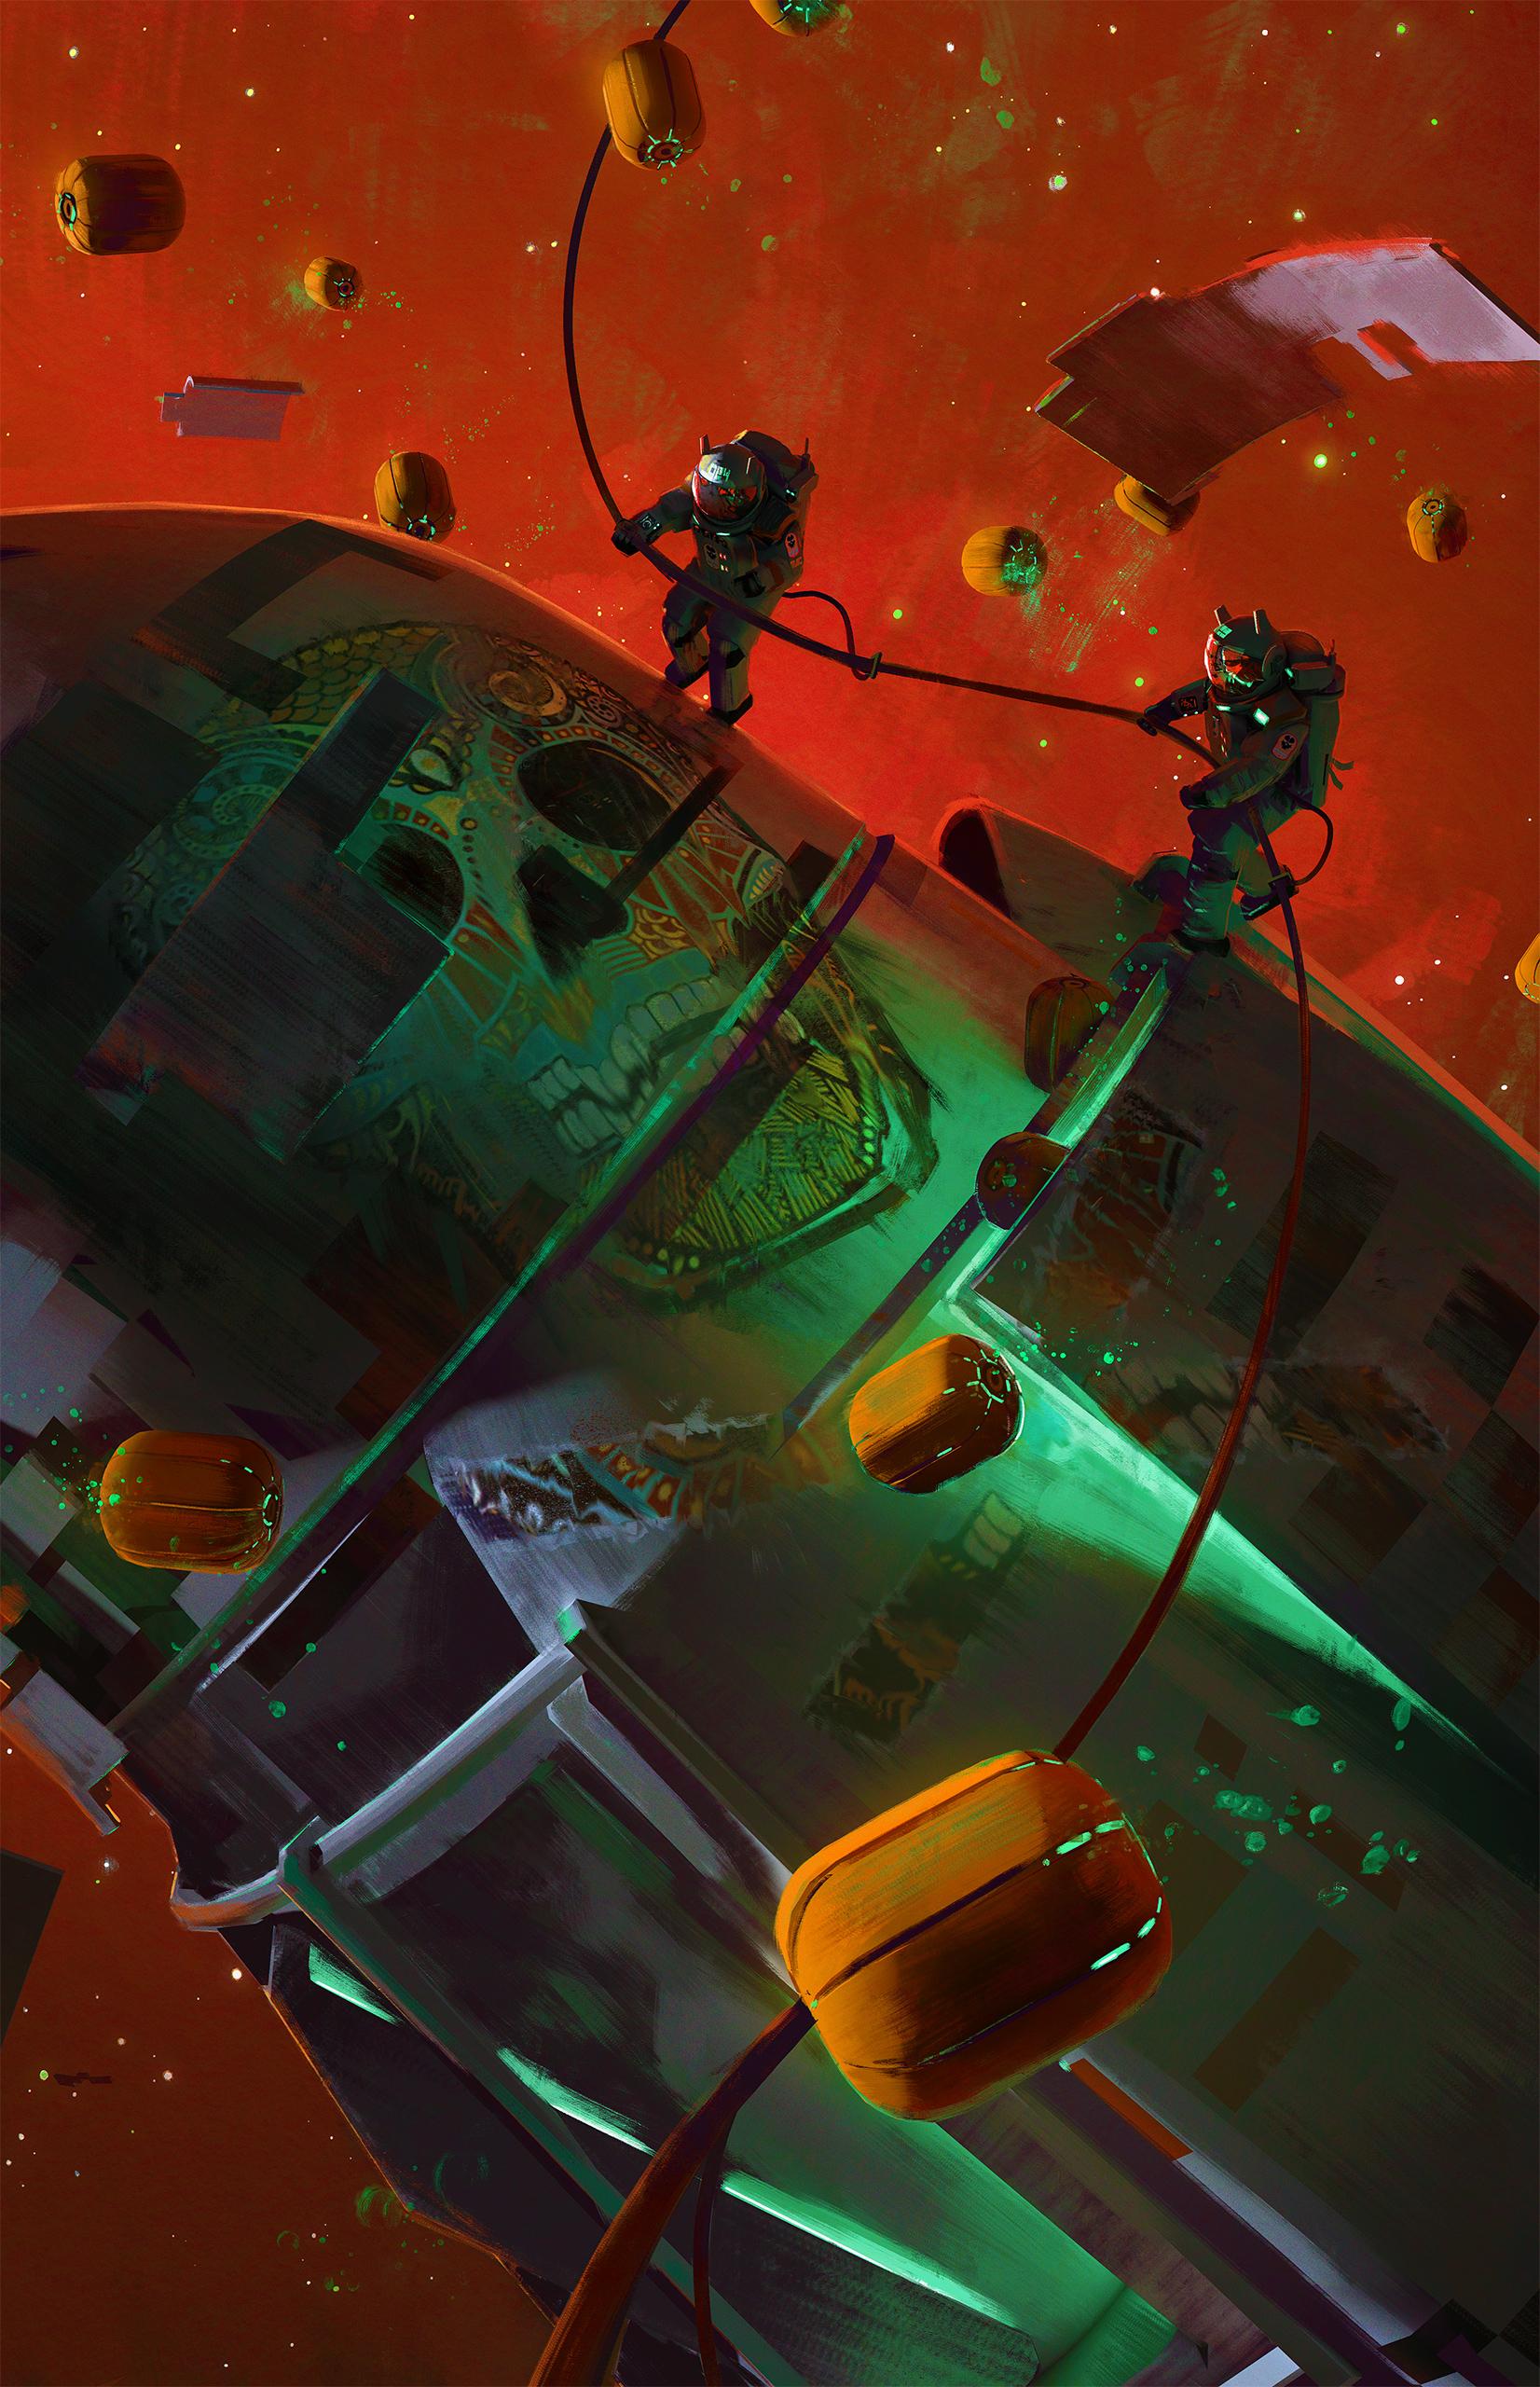 Pumpkin Space by MacRebisz